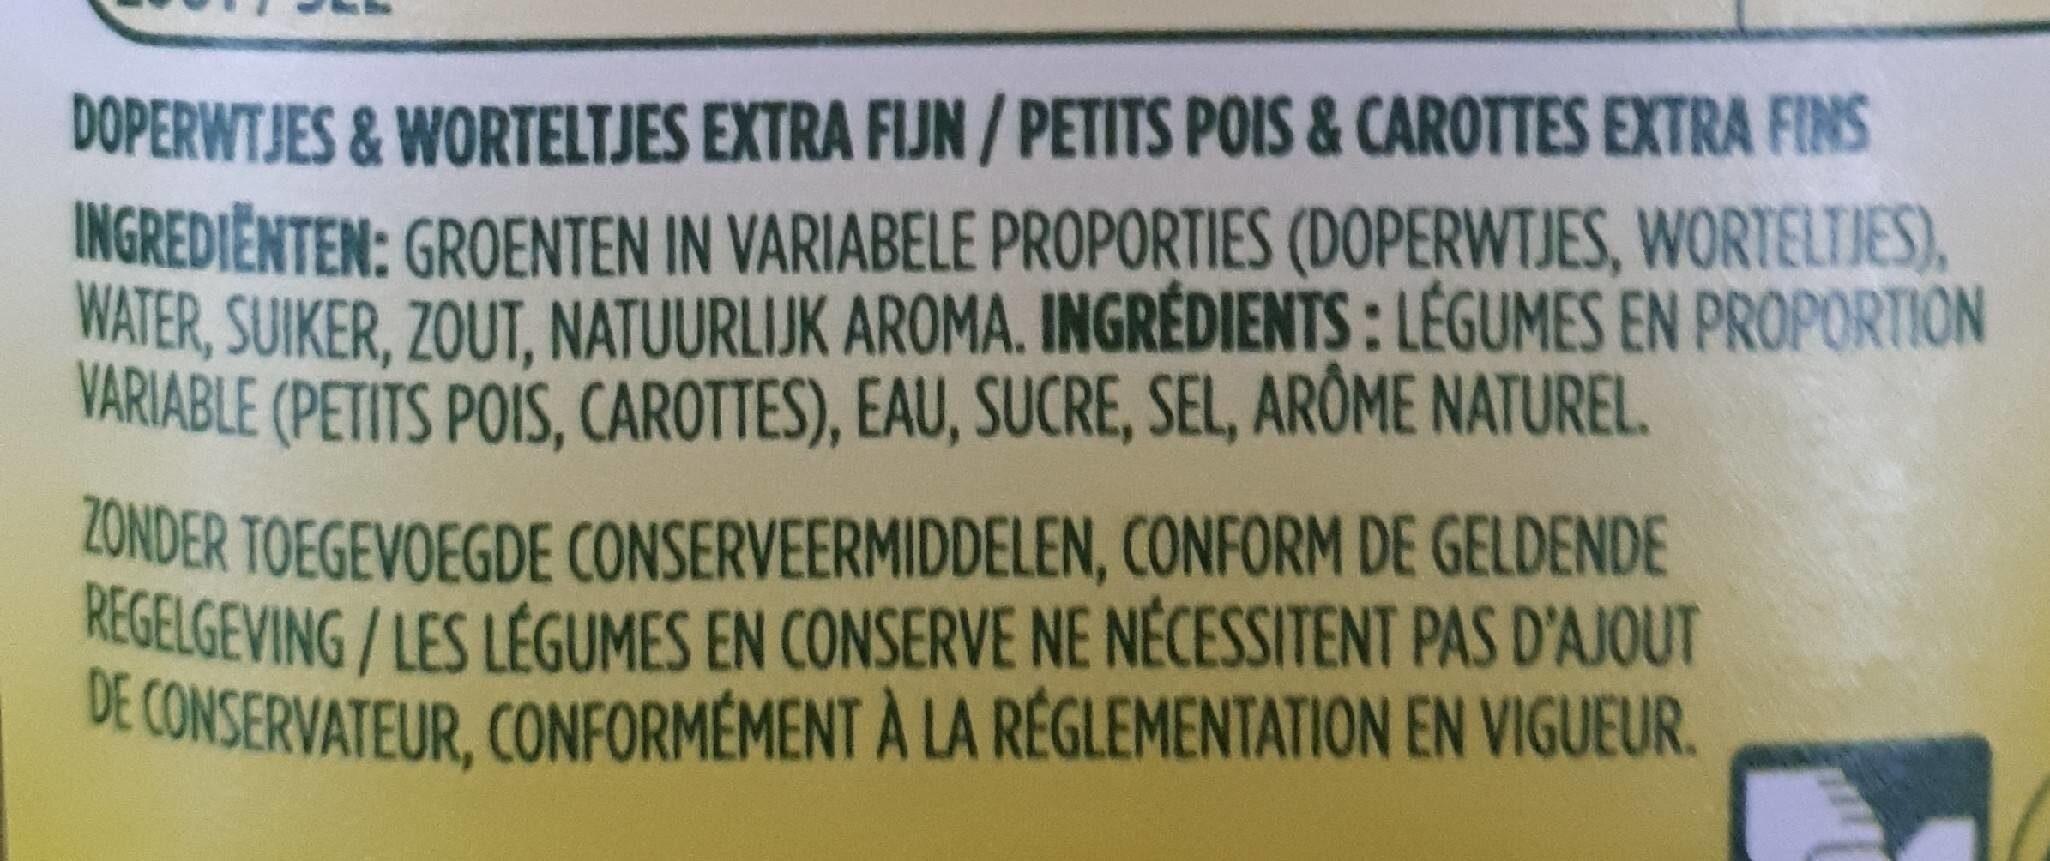 Petits pois et carottes extra fins - Ingredients - fr